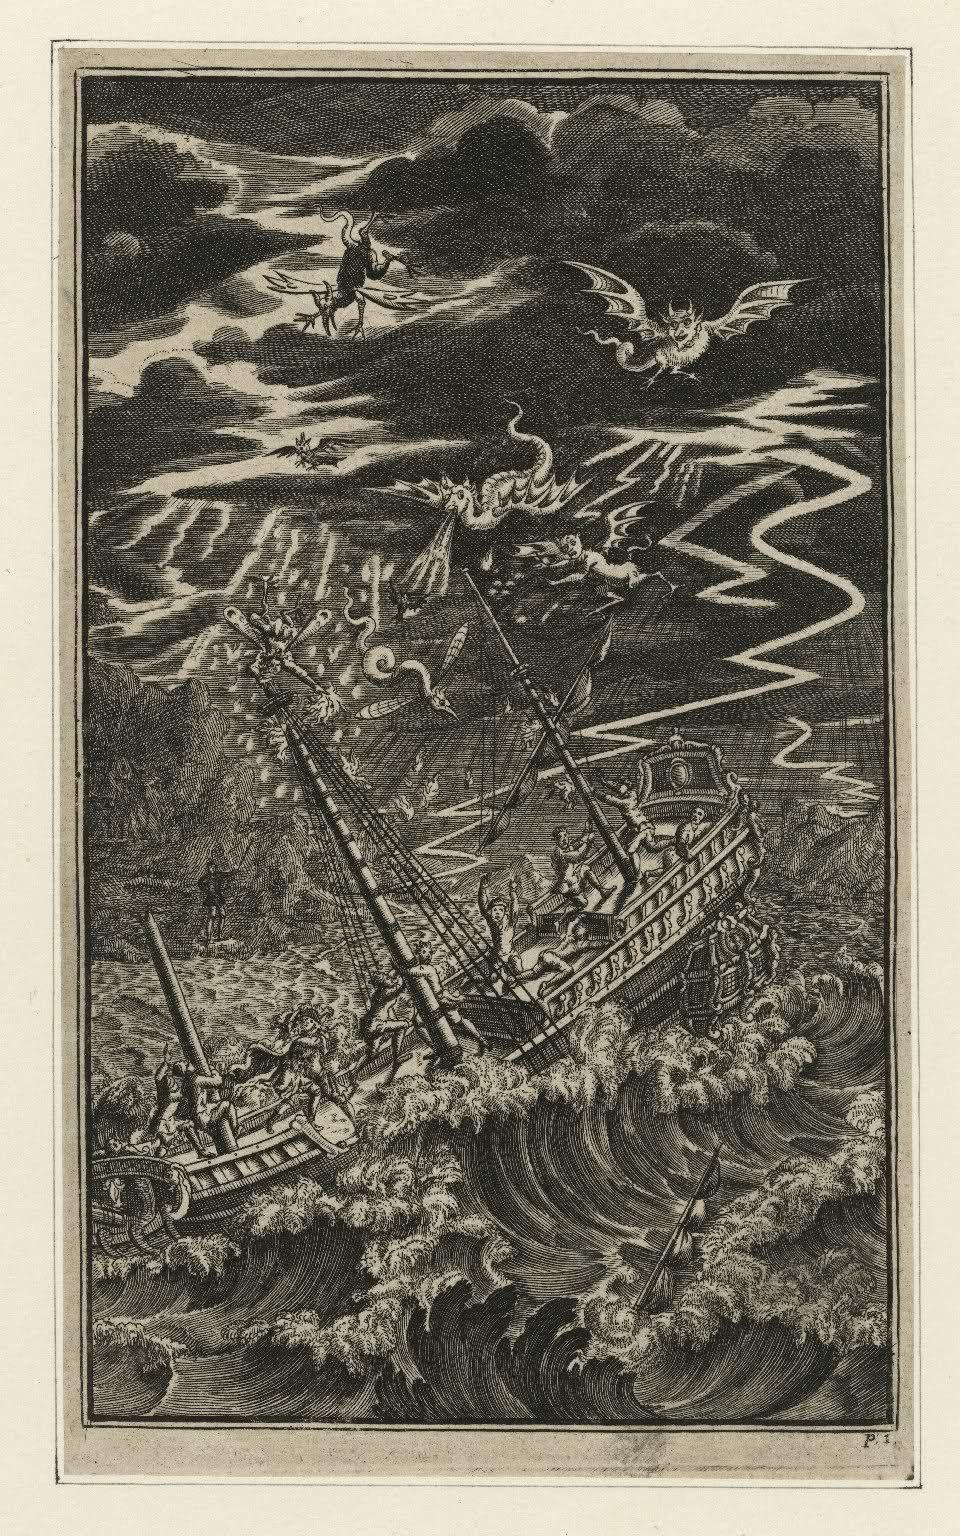 Jacob Tonson - The Tempest, act 1, scene 1, (engraving) 1709.